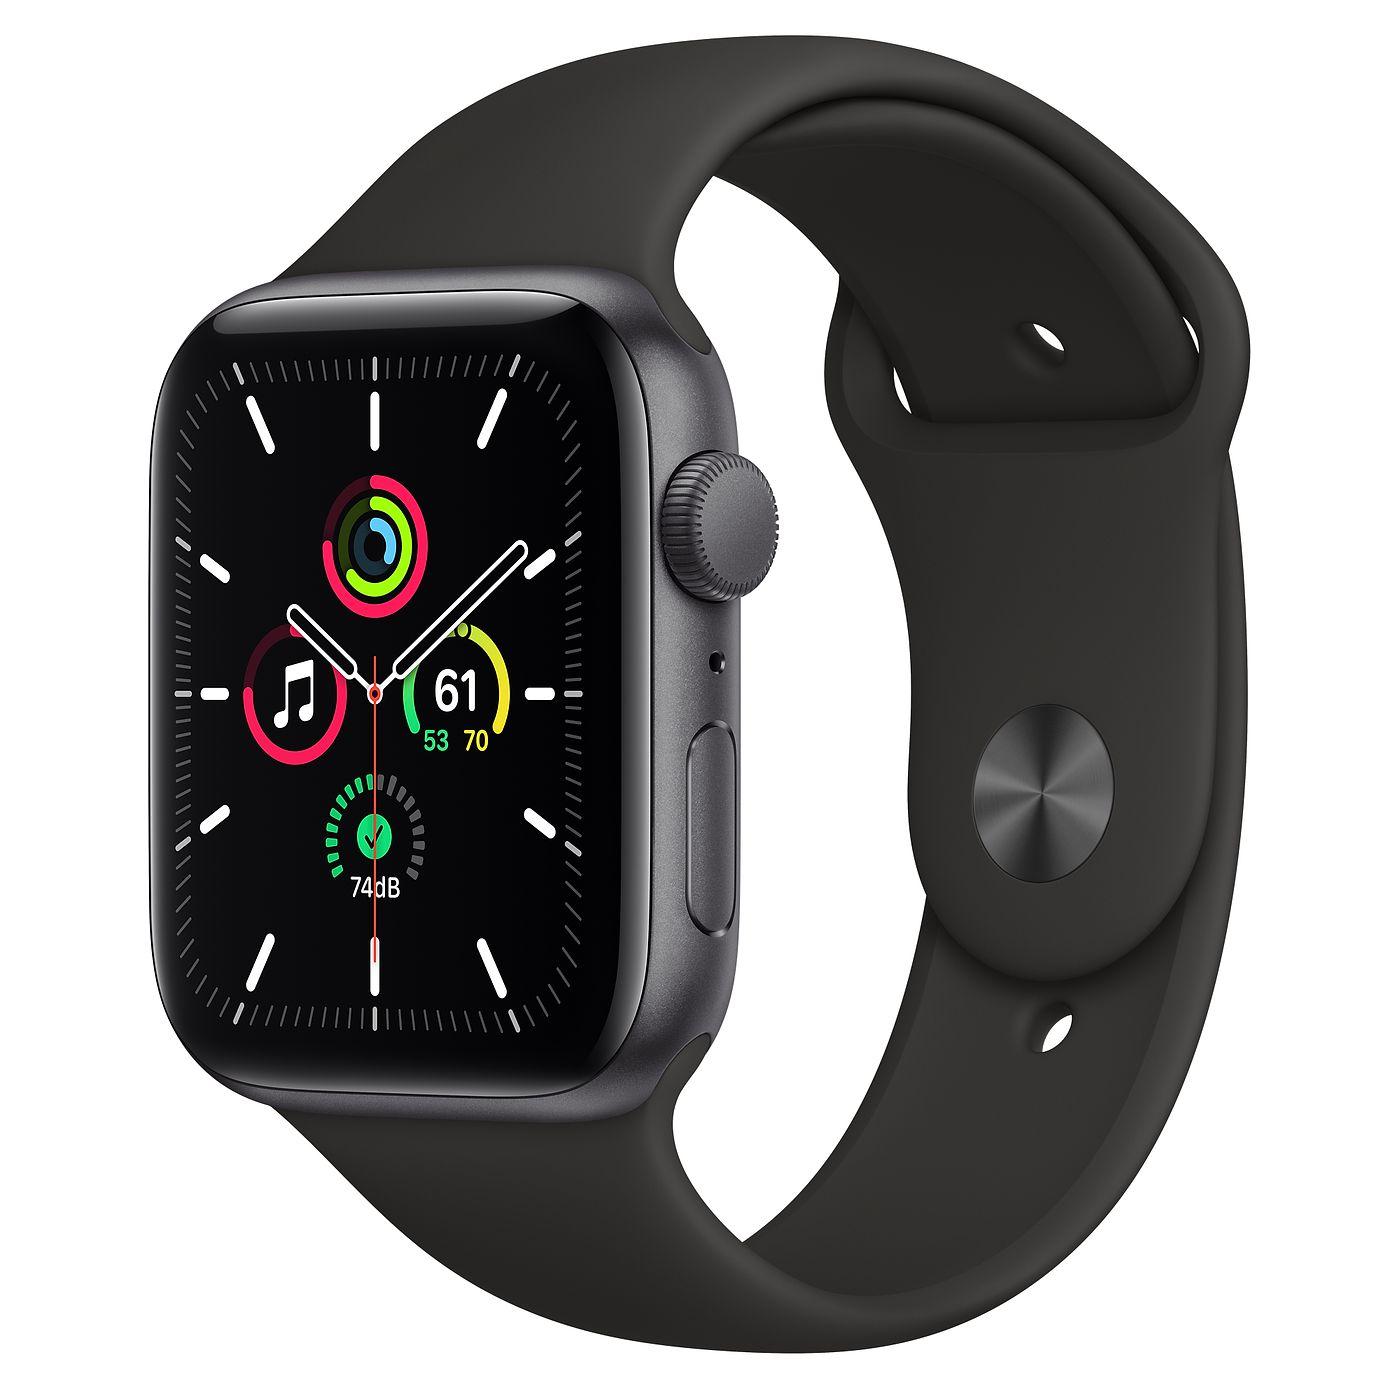 Apple 2020년 애플워치 SE, 44mm, GPS, 스페이스 그레이 알루미늄 케이스, 블랙 스포츠 밴드